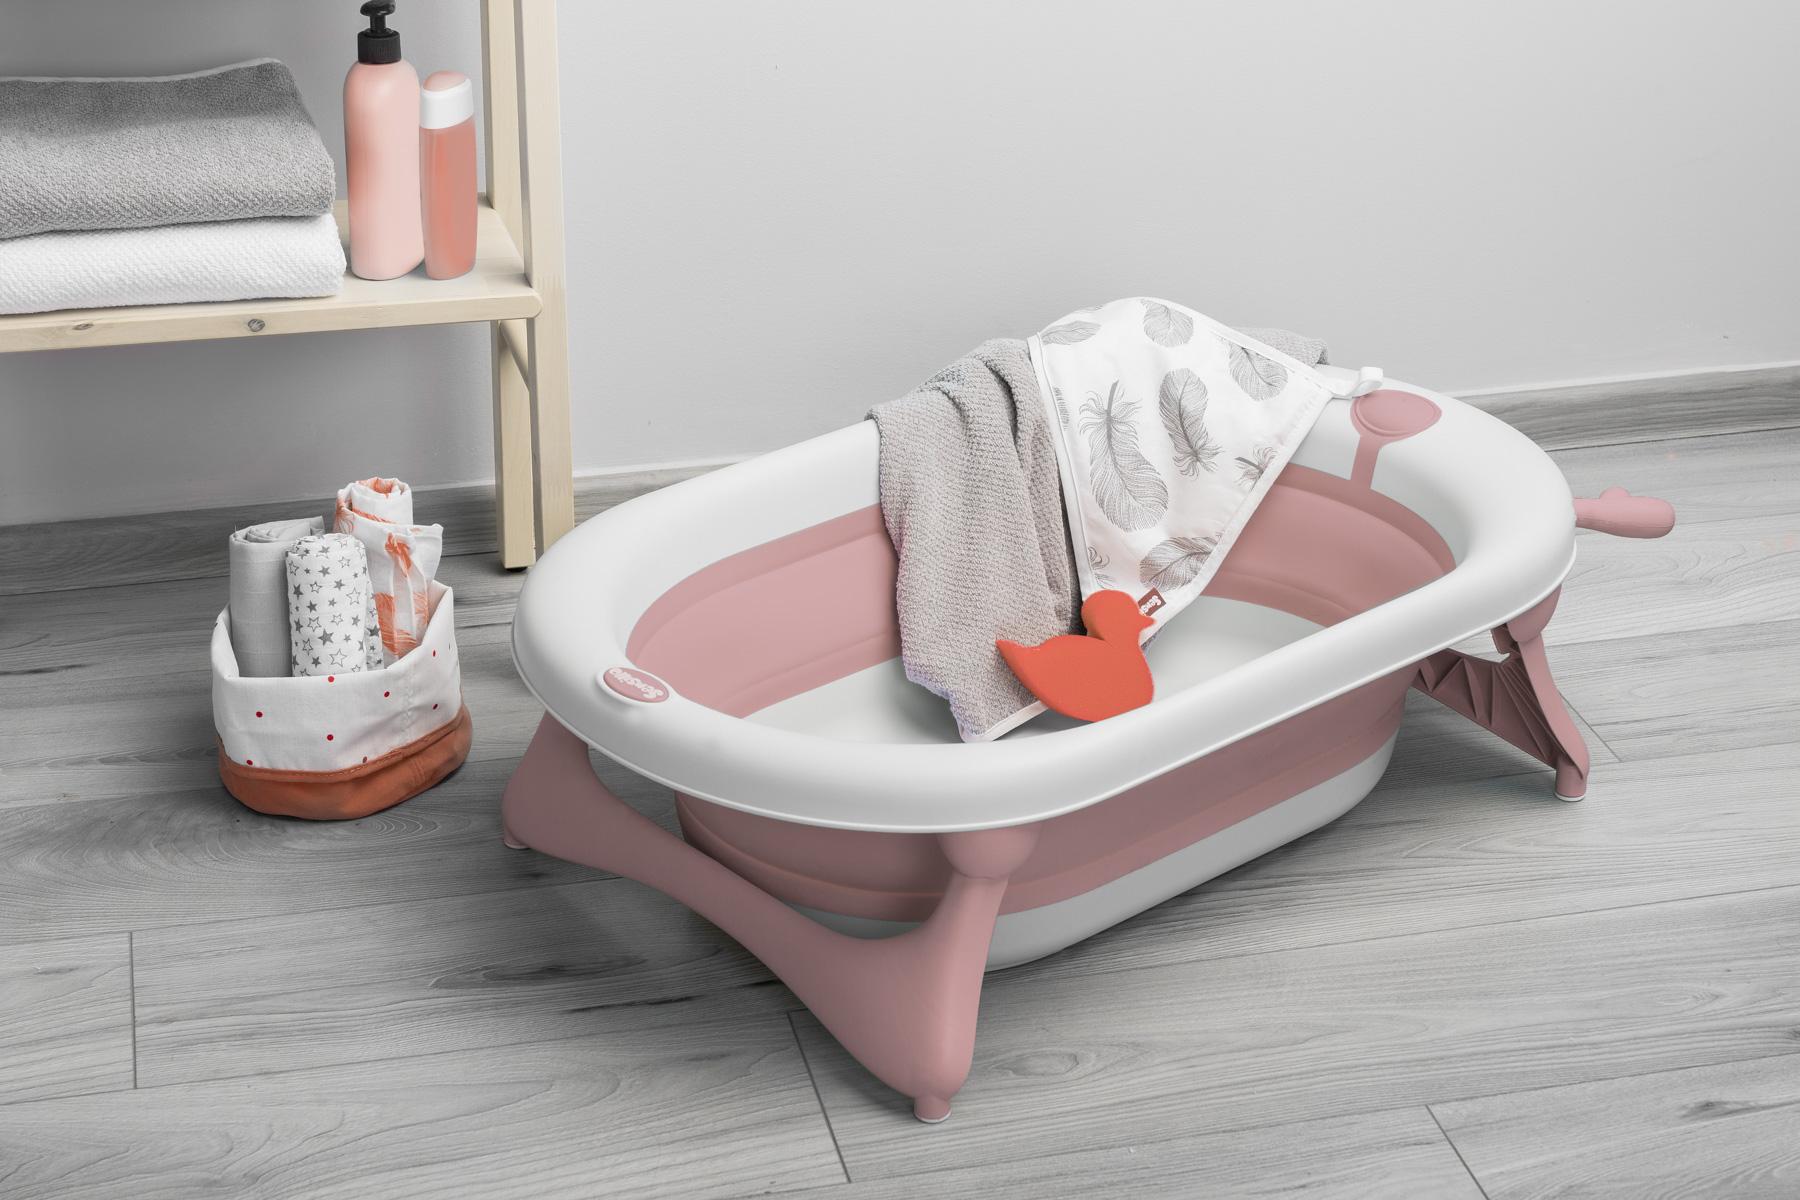 https://www.sensillo.pl/wp-content/uploads/2021/05/wanienka_skladana_powder_pink_14-1.jpg